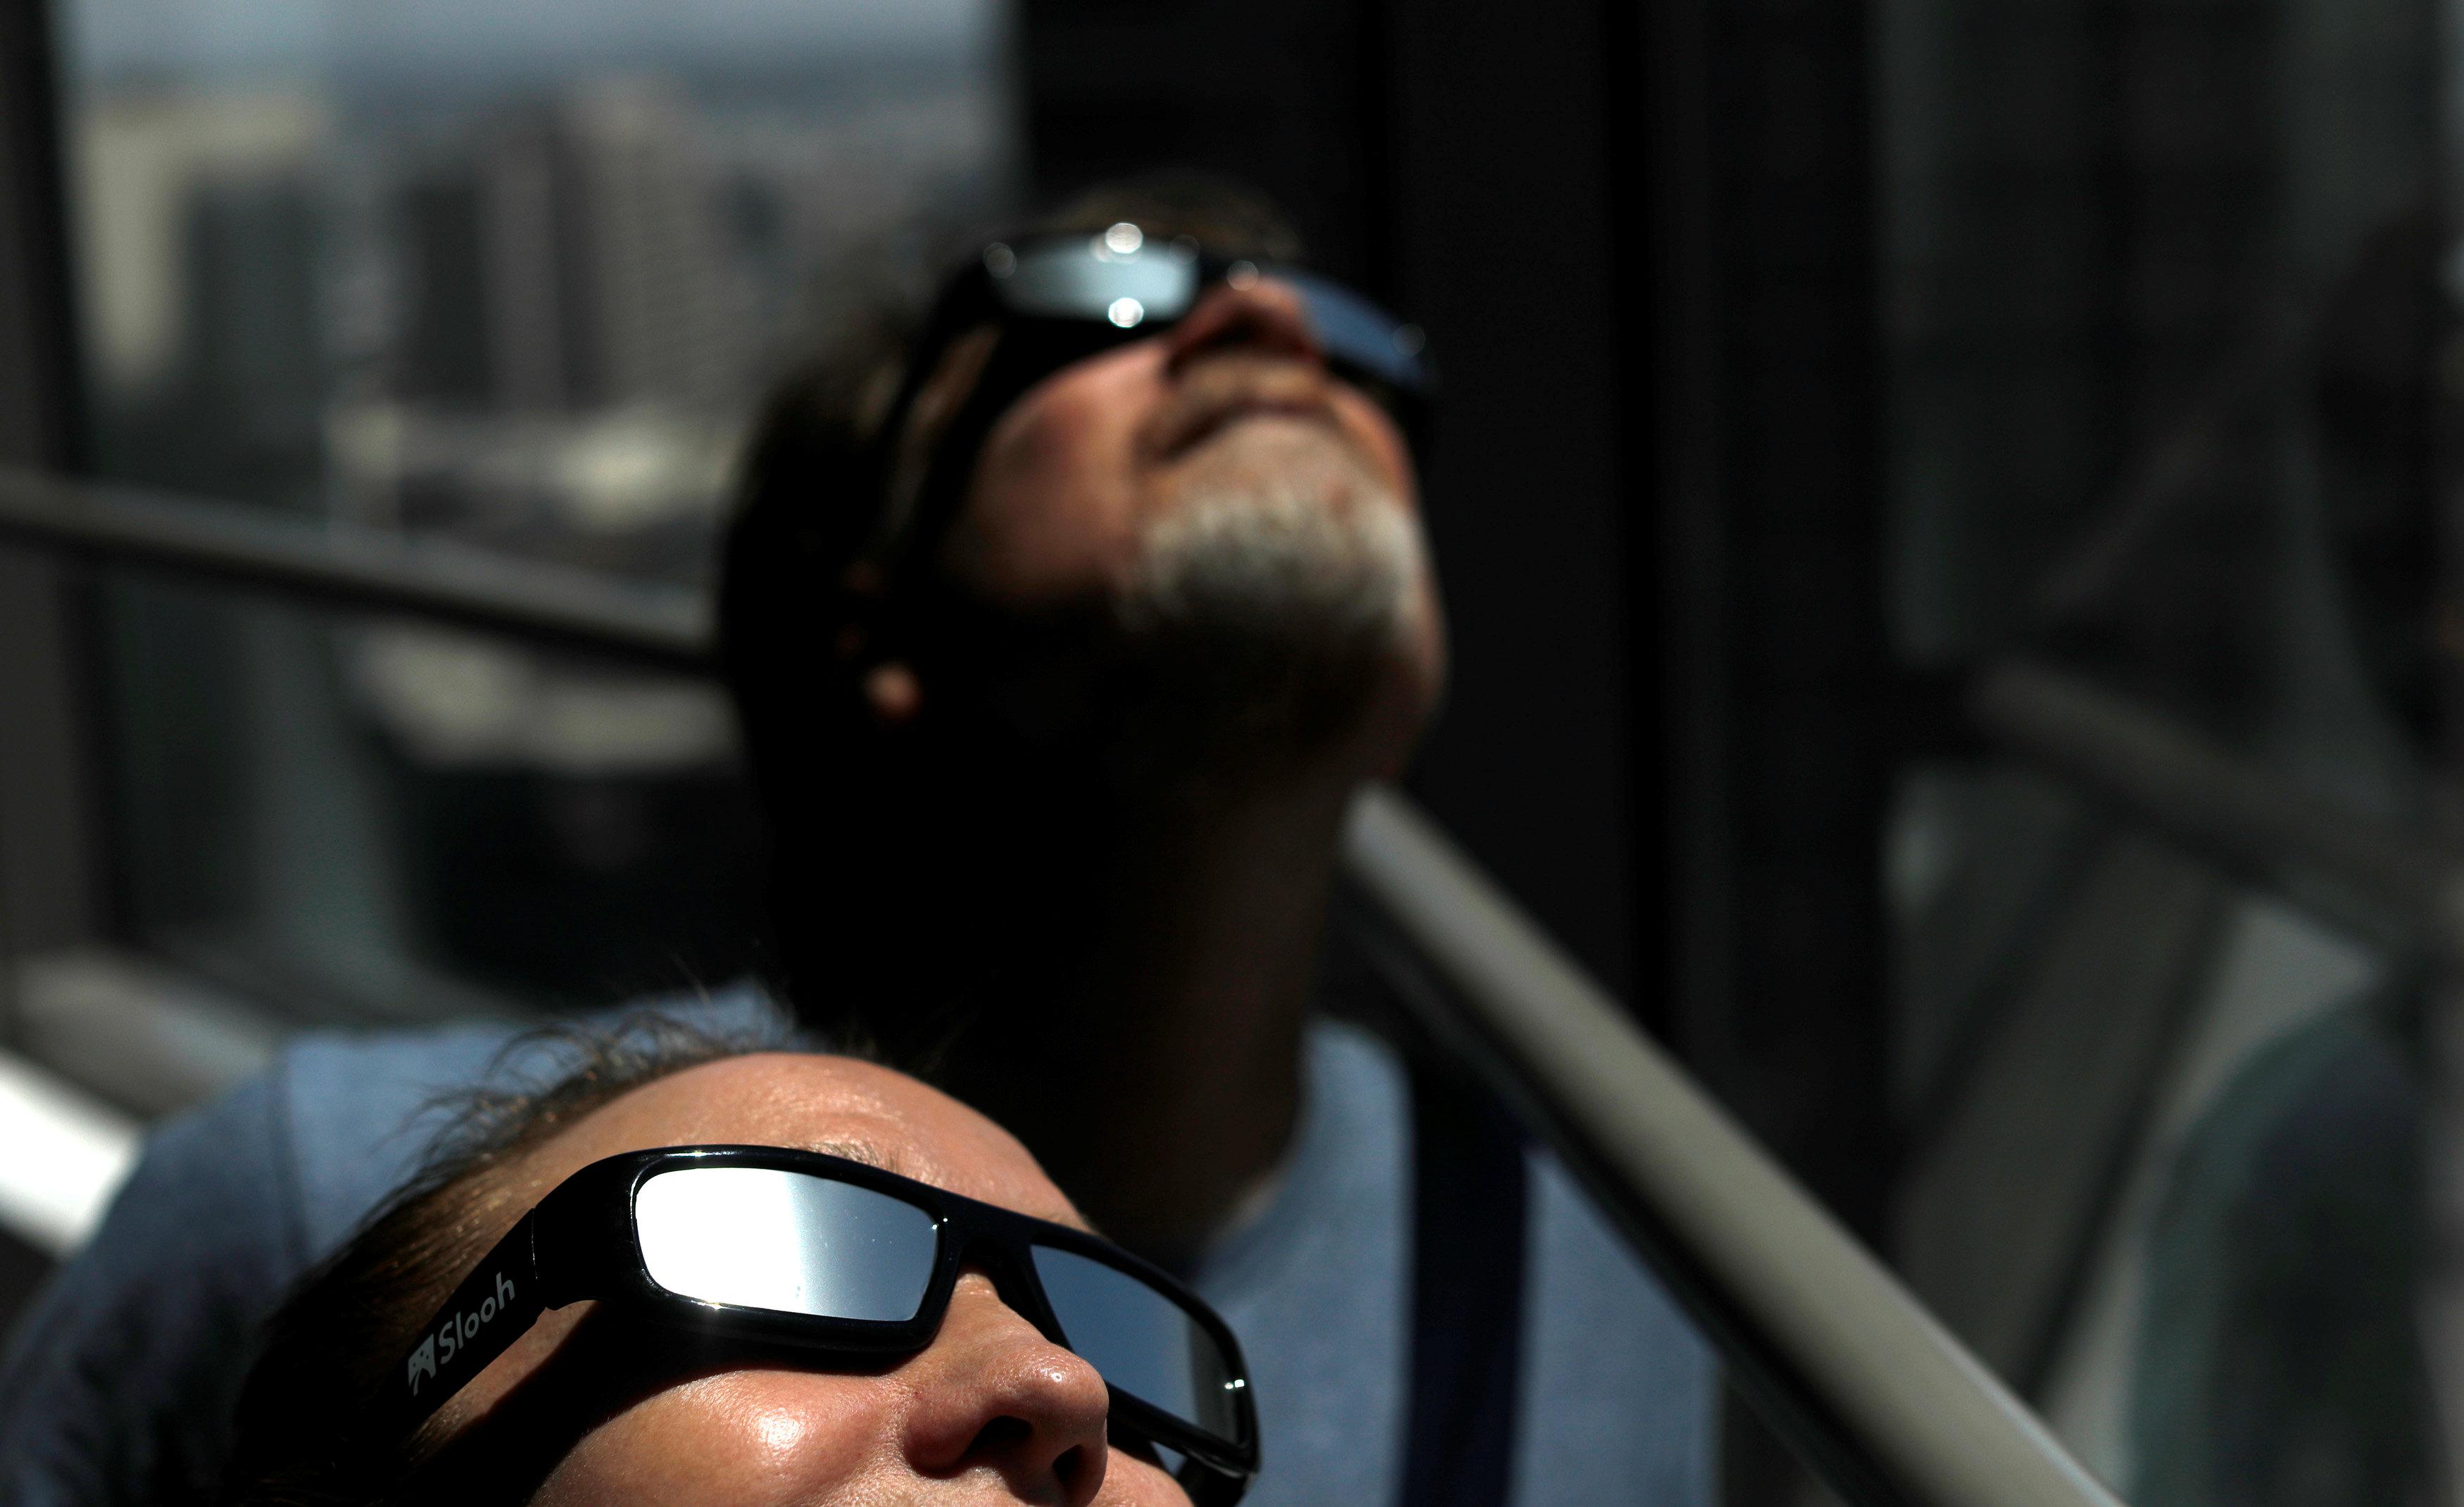 Solar eclipse sunglasses are pictured in Los Angeles, California, U.S., August 8, 2017. REUTERS/Mario Anzuoni